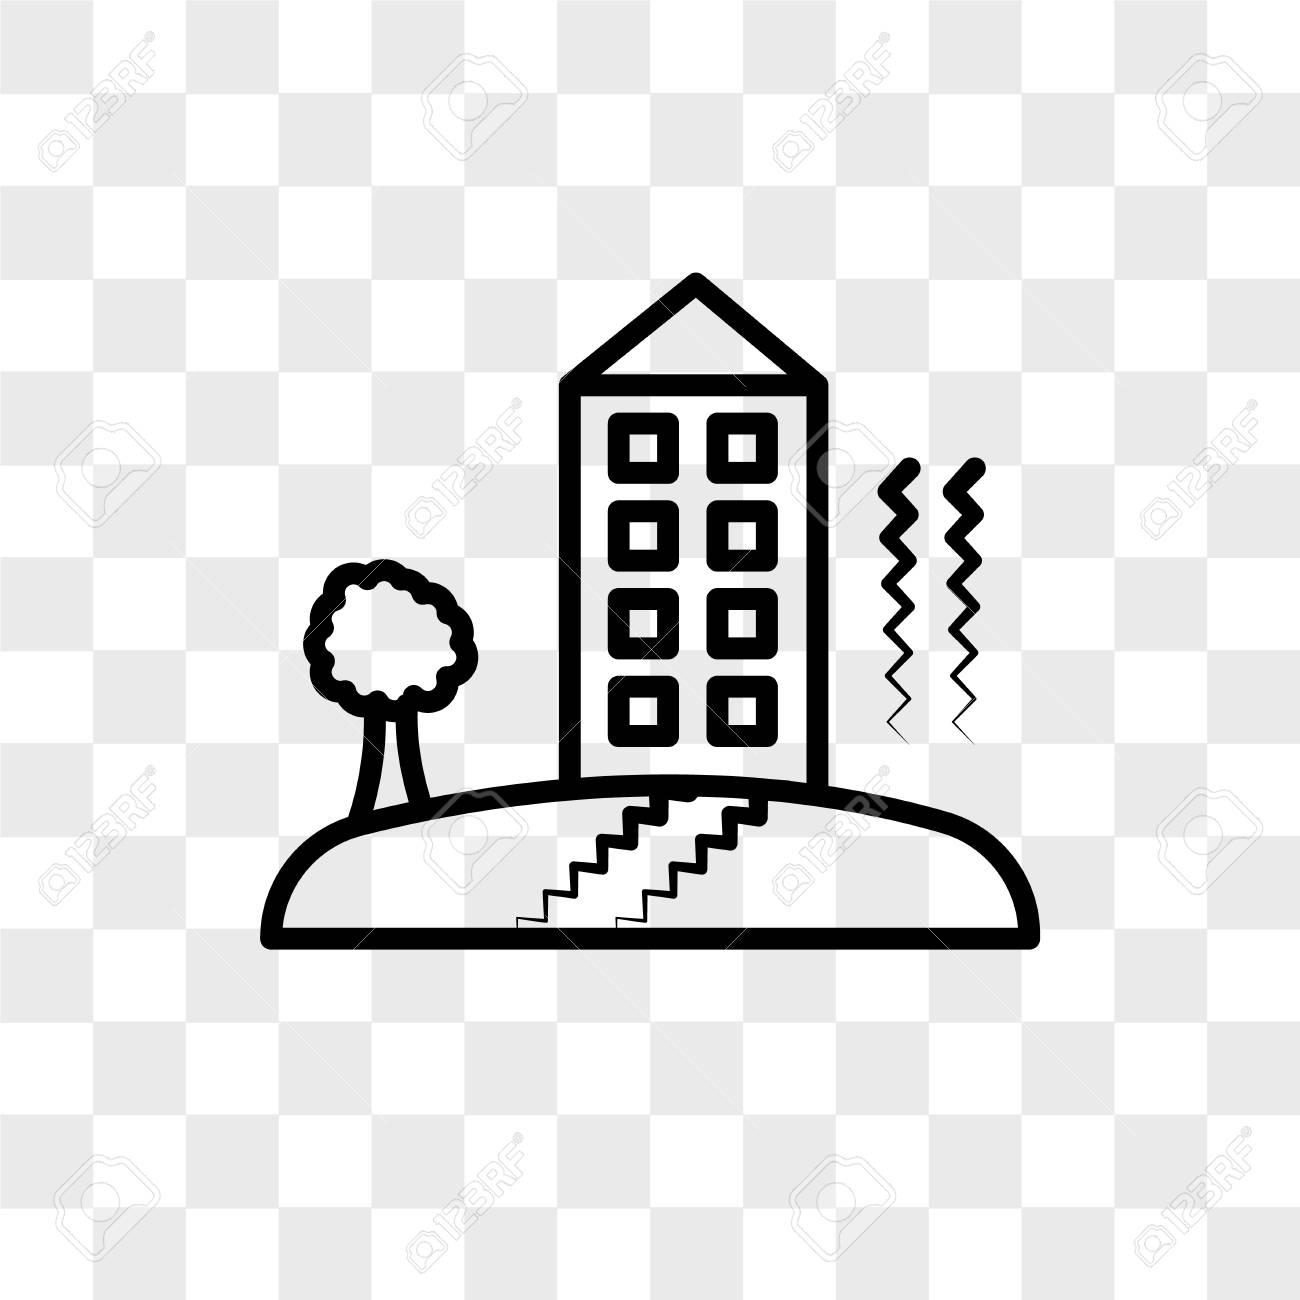 Earthquake clipart aftershock, Earthquake aftershock Transparent FREE for  download on WebStockReview 2020